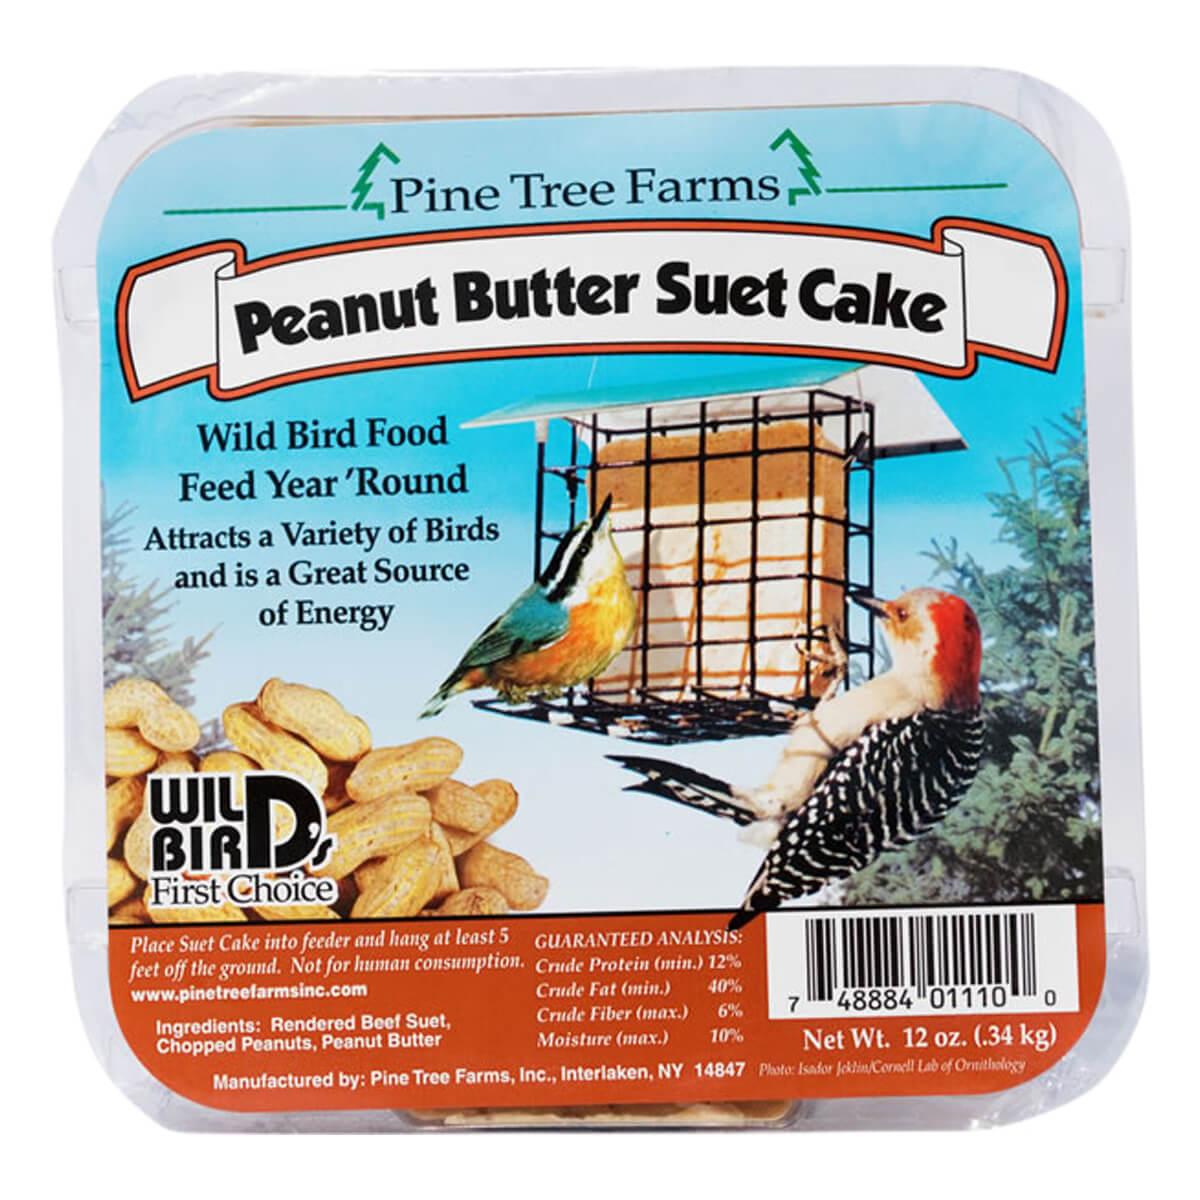 Pine Tree Farms Peanut Butter Suet Cakes